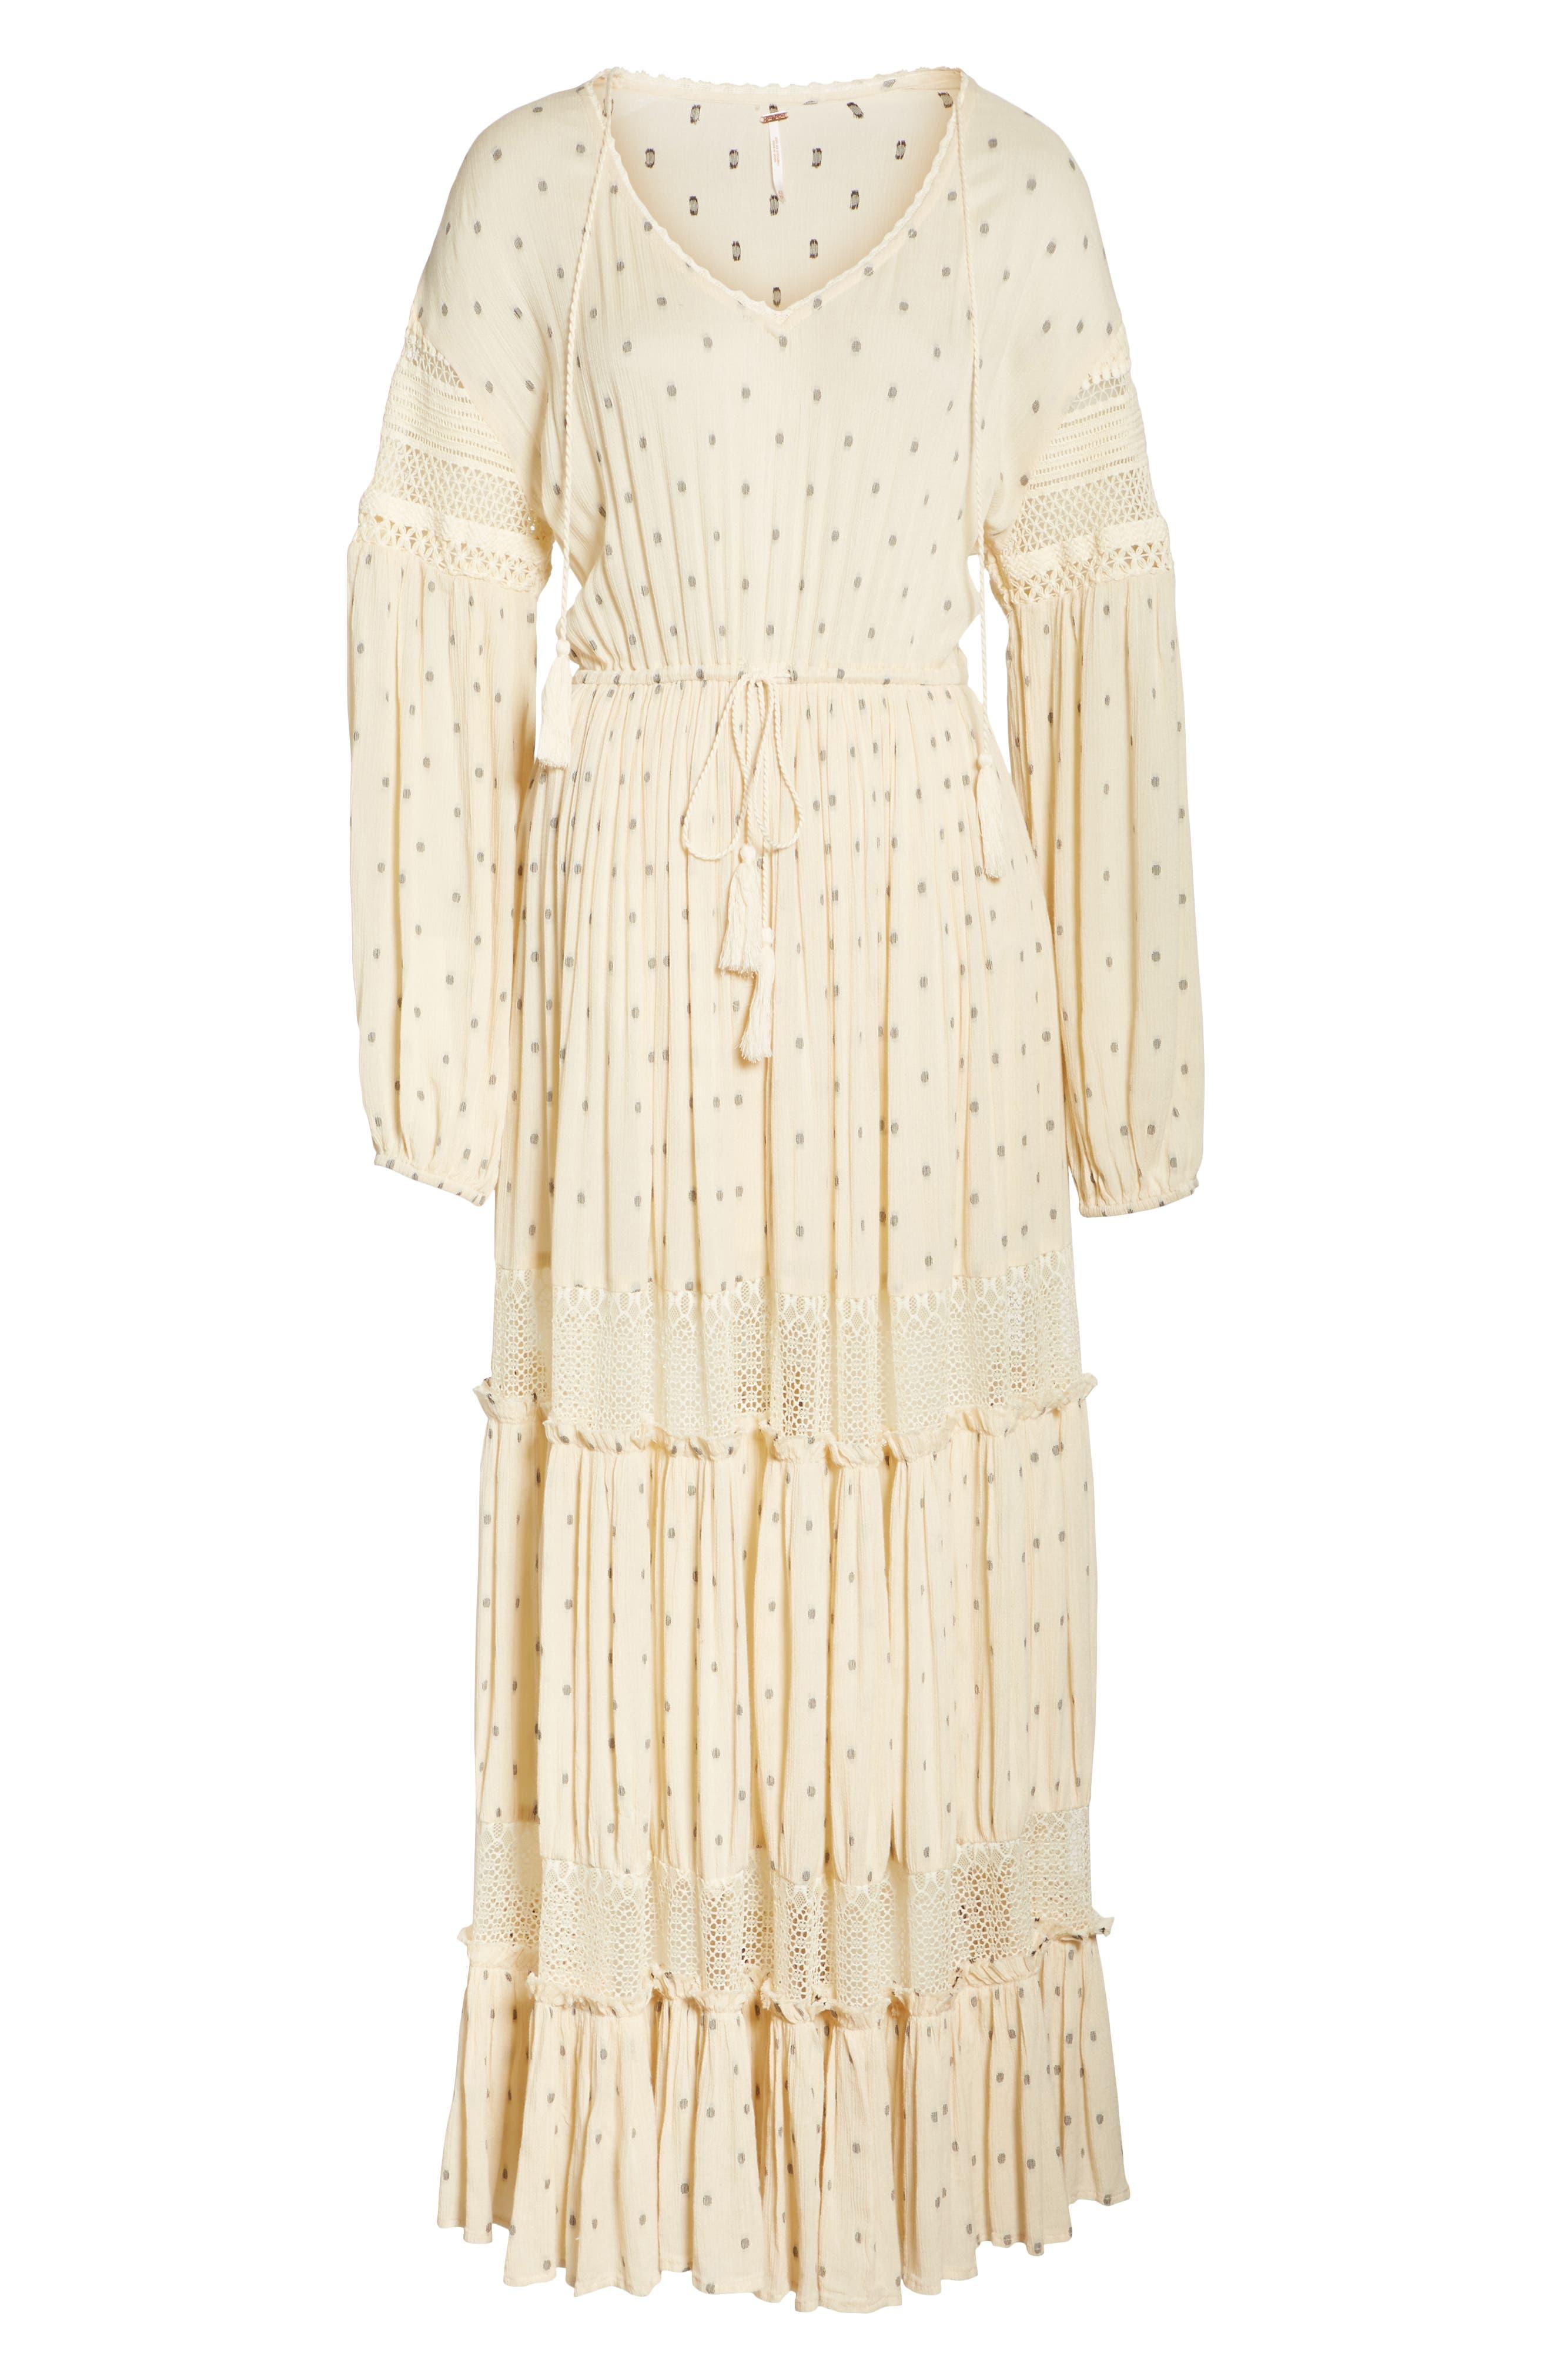 Sada Maxi Dress,                             Alternate thumbnail 7, color,                             903